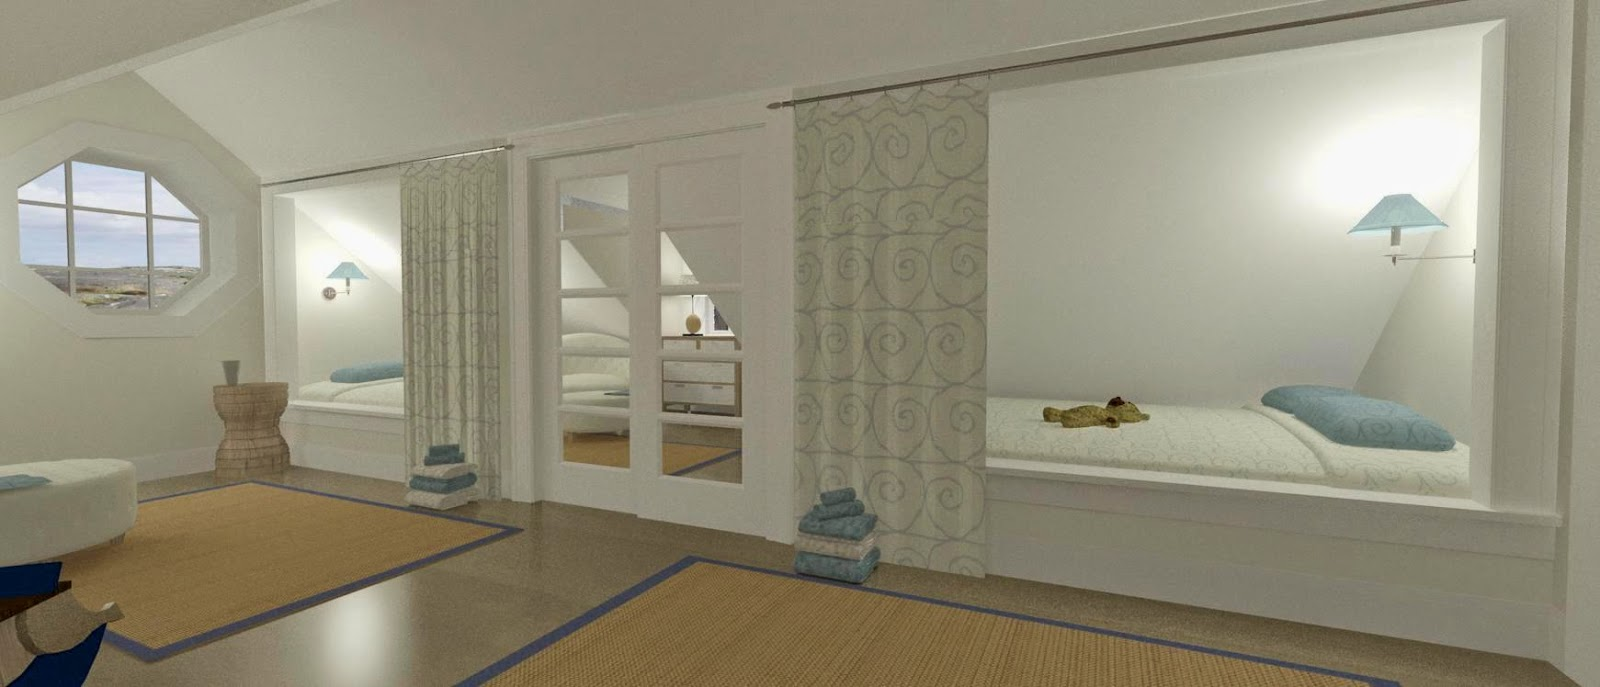 Den vita drömgården: ett fritidshus i new england stil